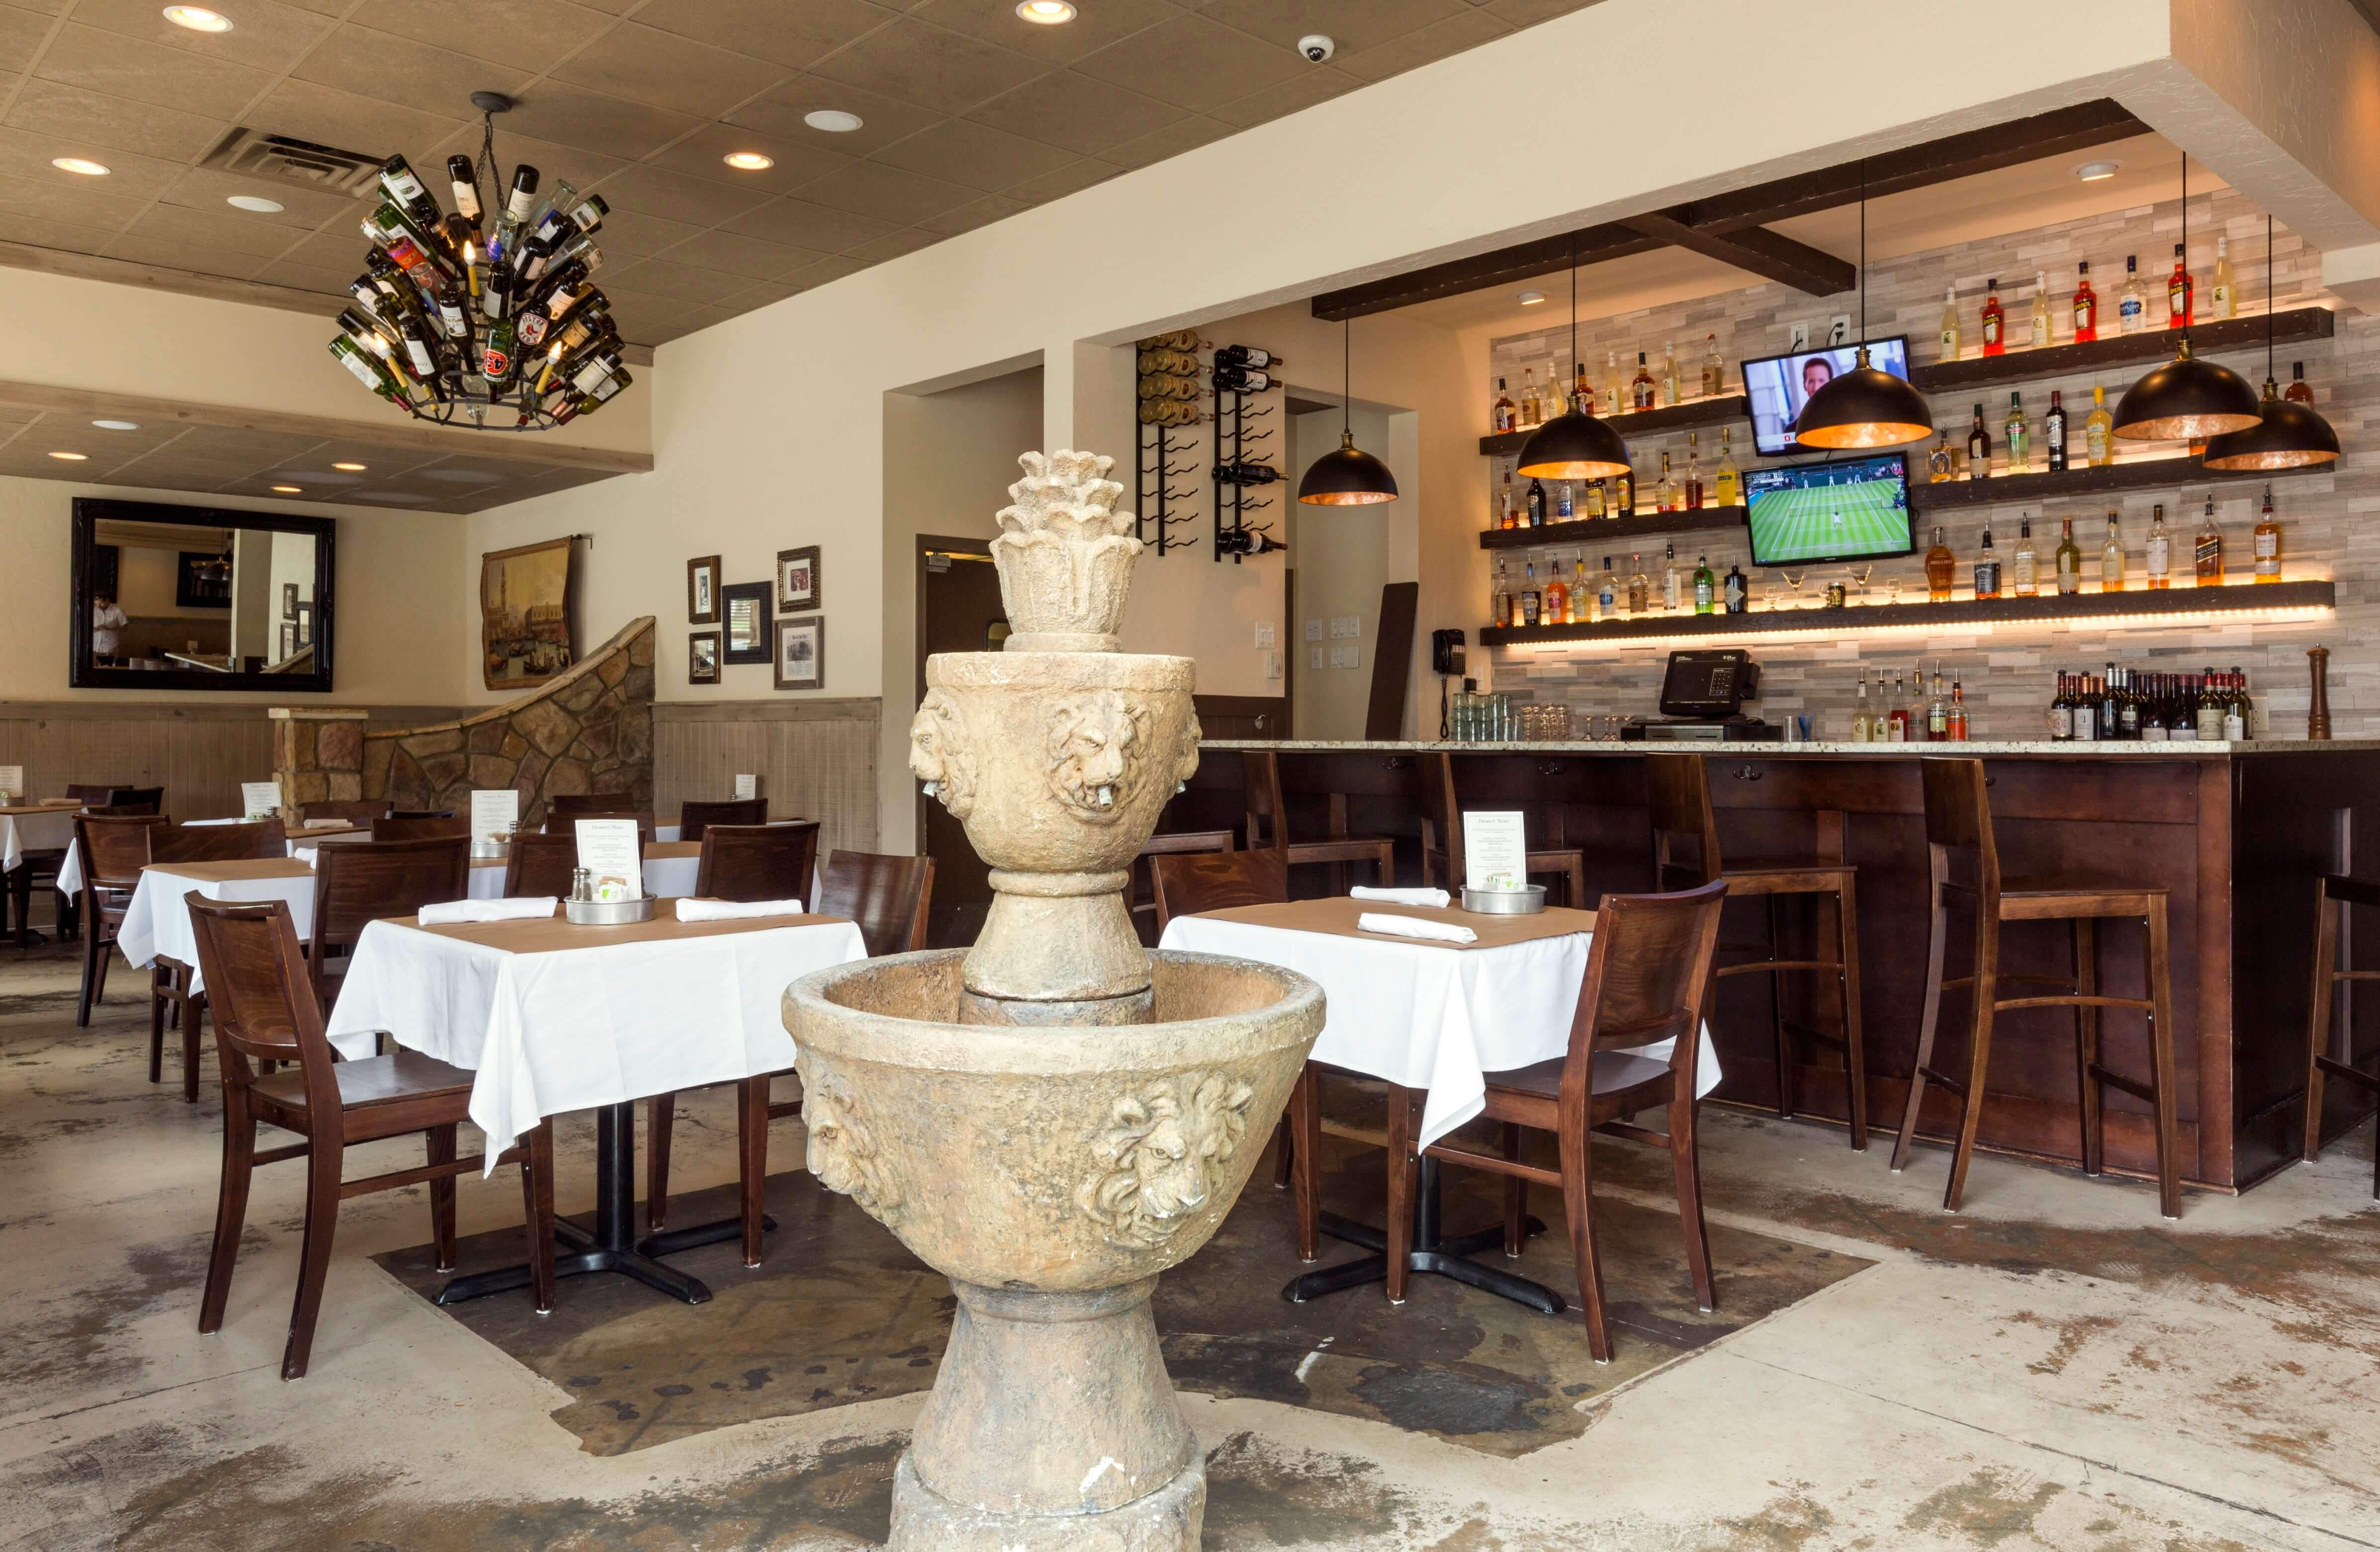 Restaurants Italian Near Me: Lucia's Italian Restaurant Coupons Near Me In Roswell